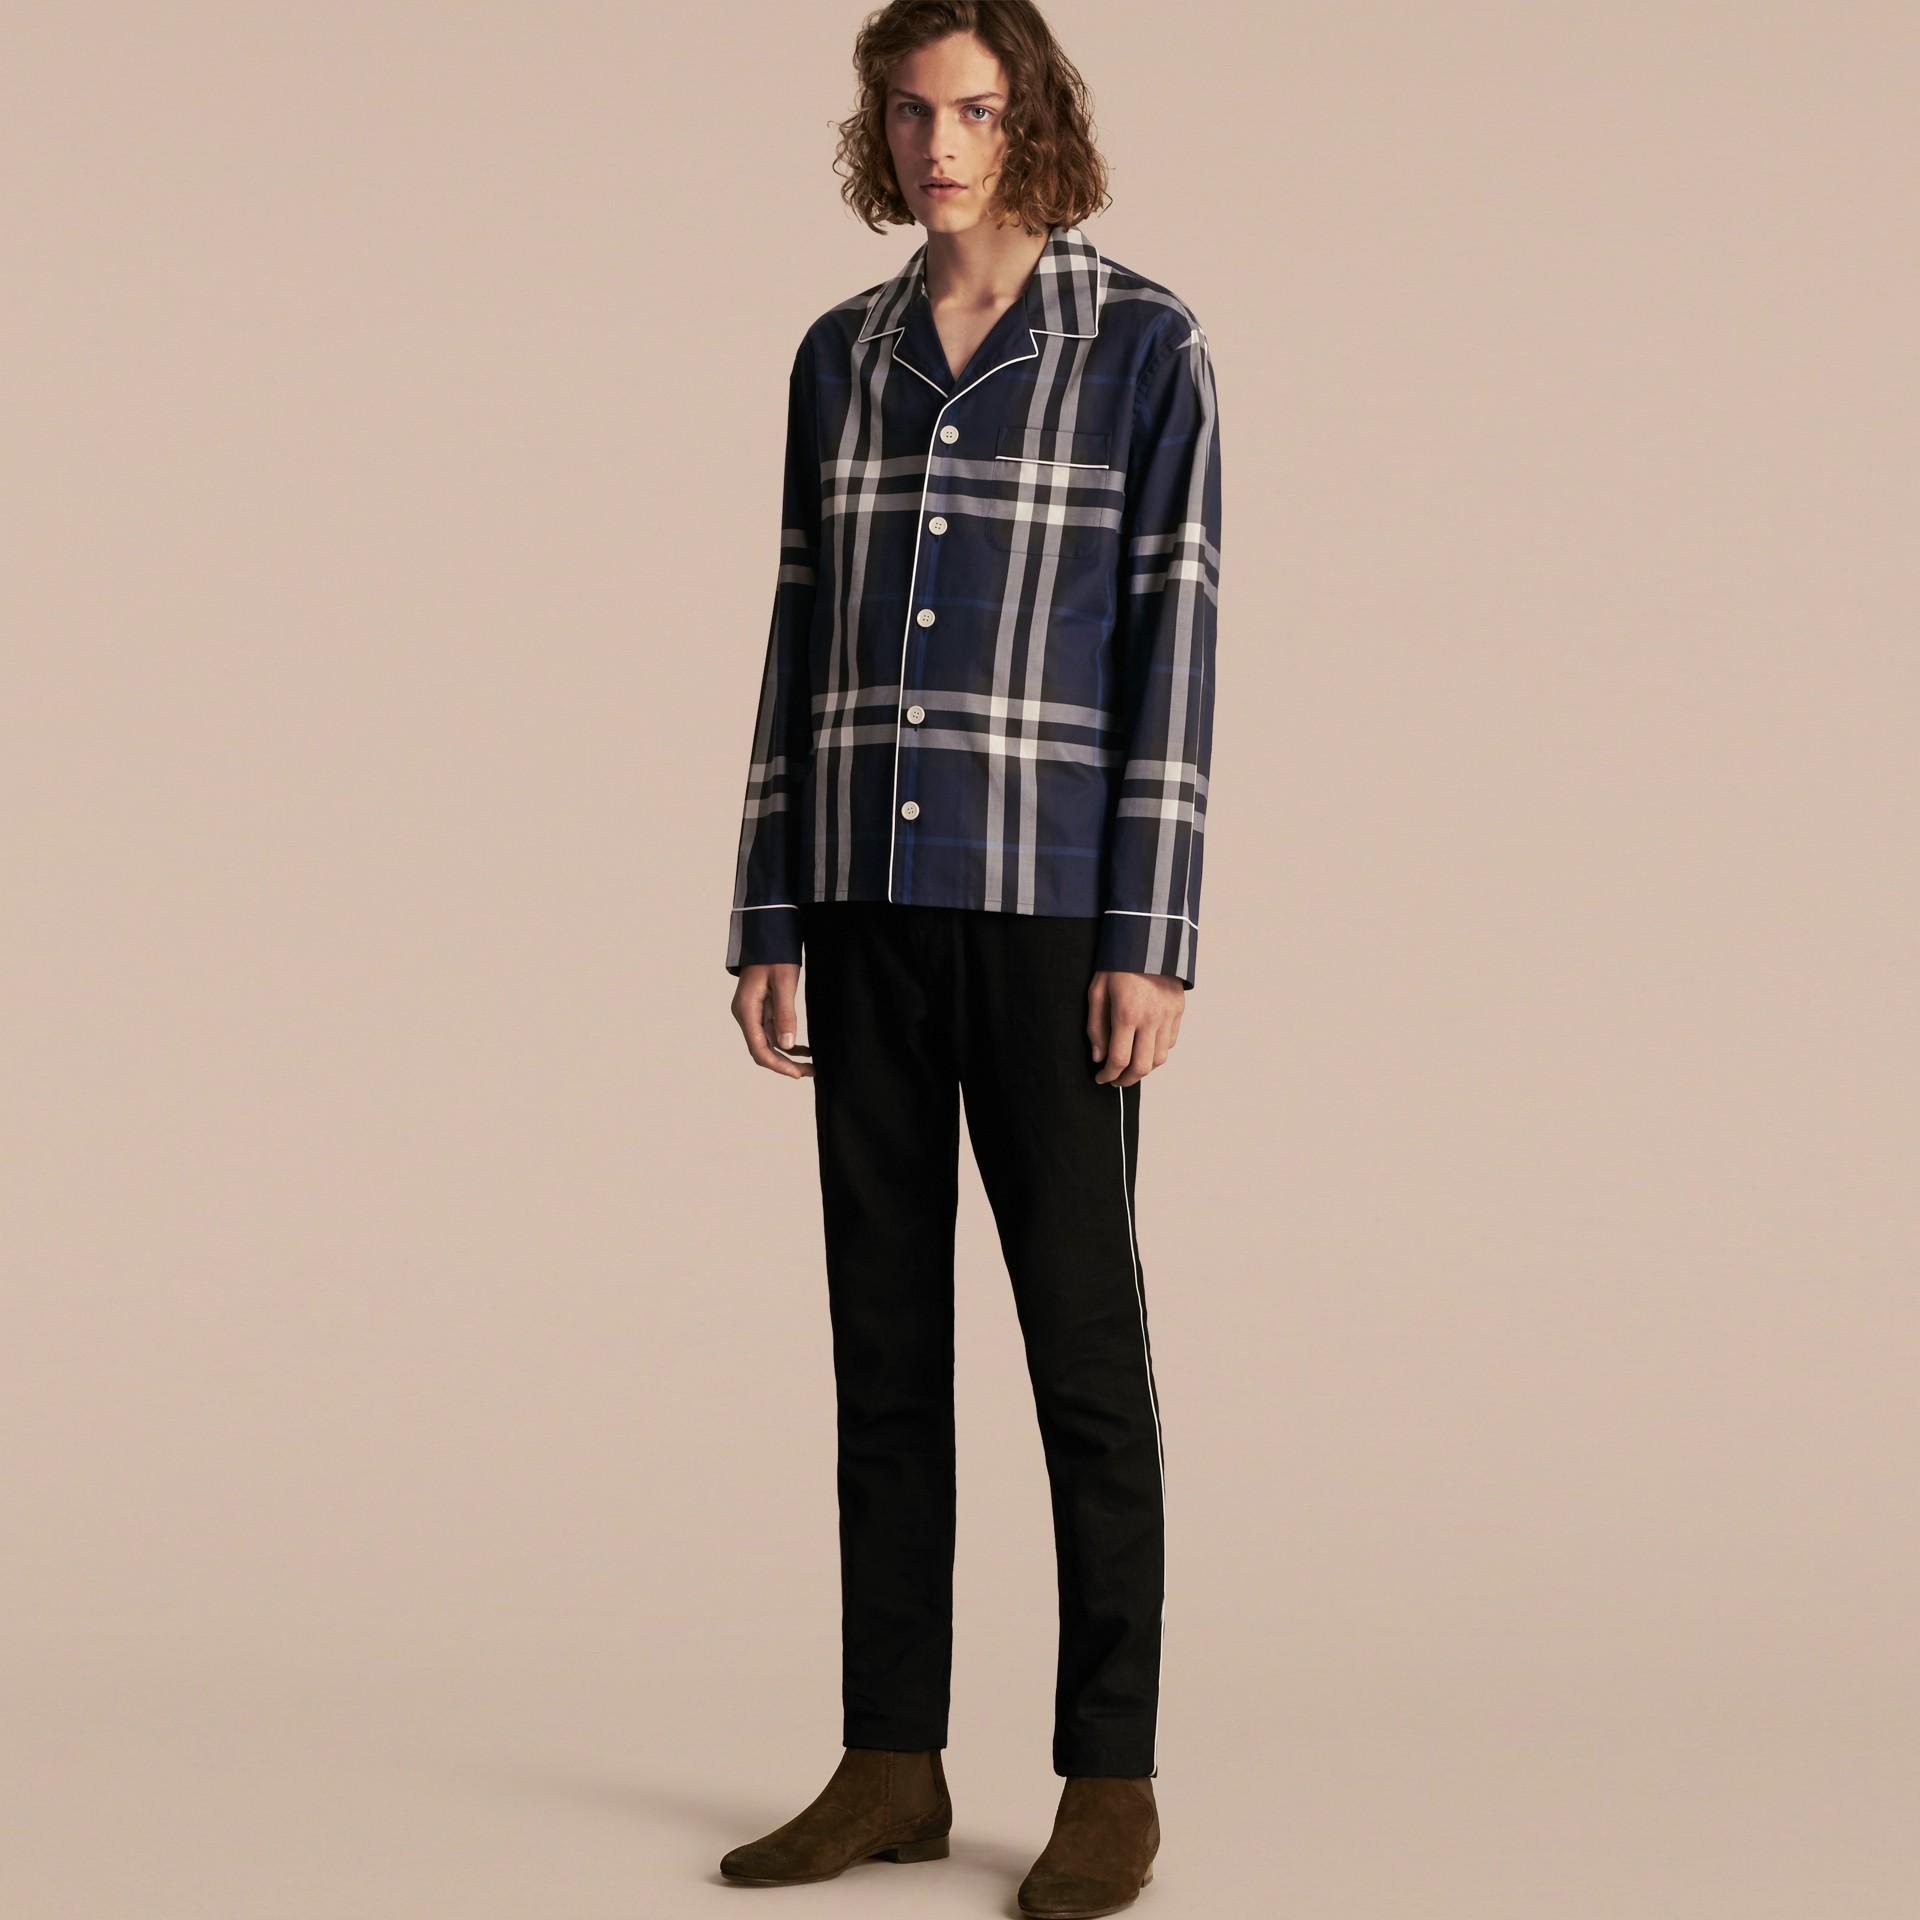 Indigo blue Check Cotton Pyjama-style Shirt Indigo Blue - gallery image 1